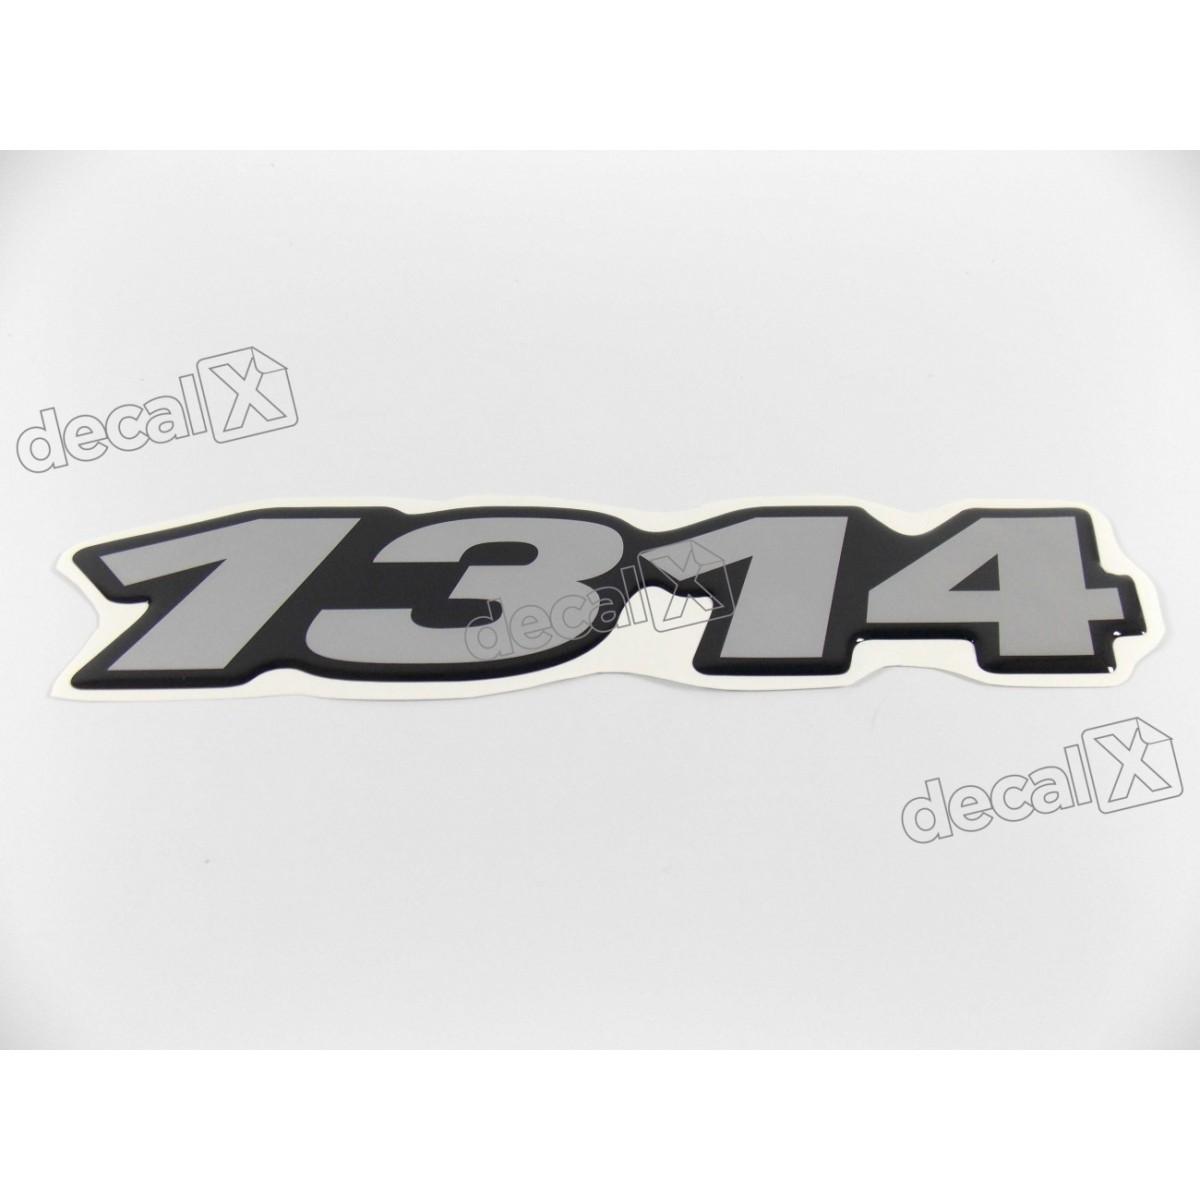 Adesivo Emblema Resinado Mercedes 1314 Cm24 Decalx